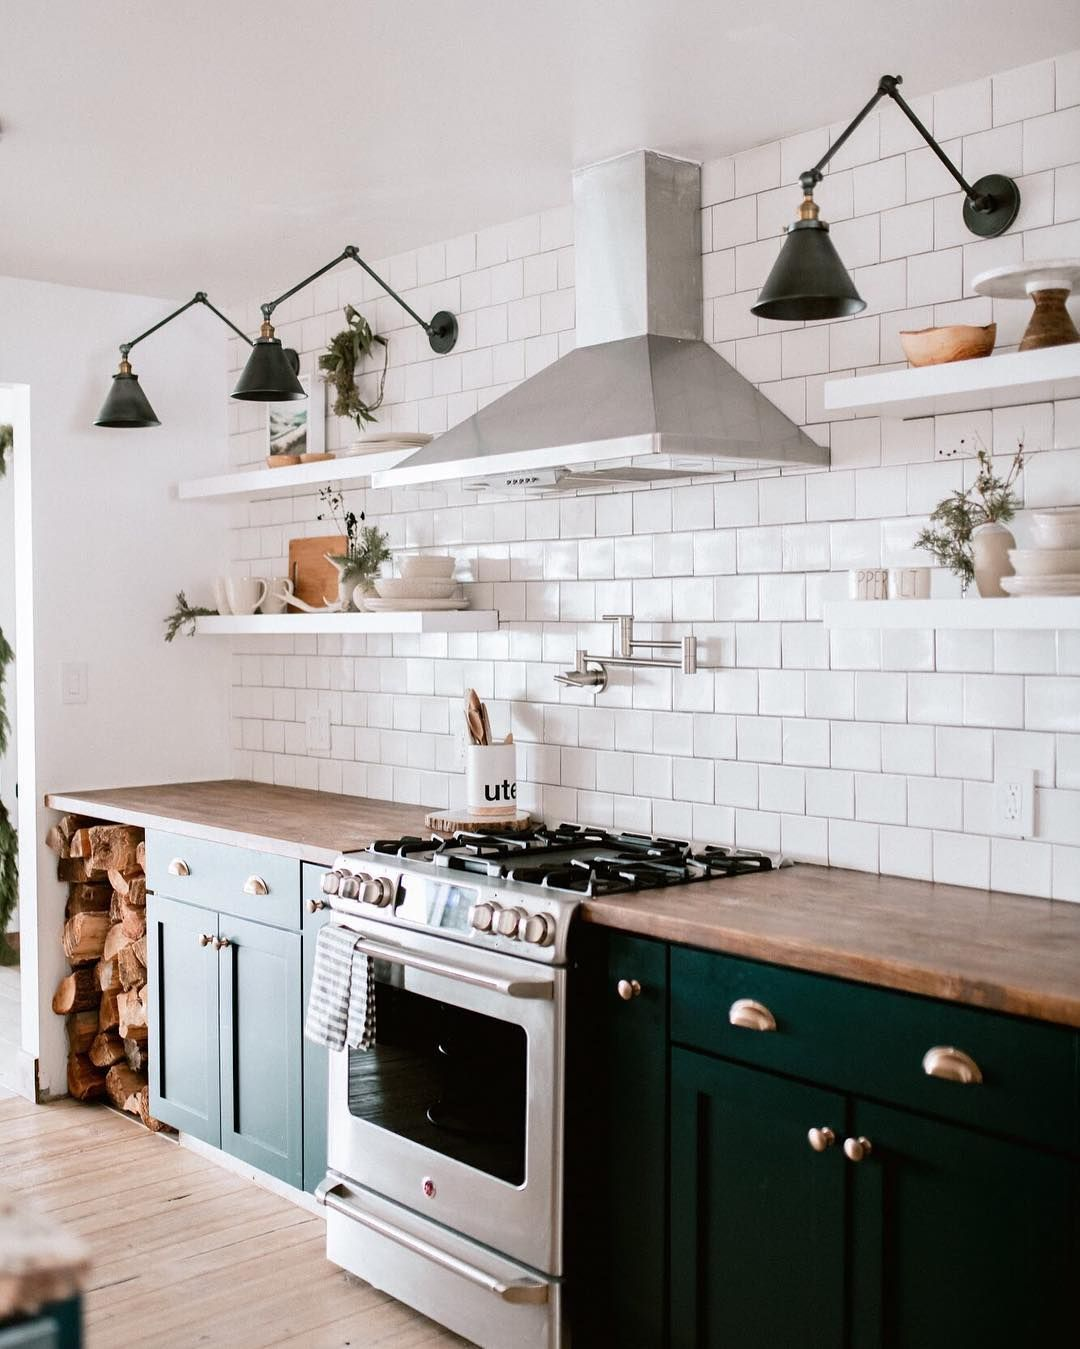 Suzy Holman On Instagram Want To Be Slightly Impressed Slash Feel Slightly Bad For Me I Haven T Be Kitchen Decor Kitchen Inspiration Design Kitchen Cabinets